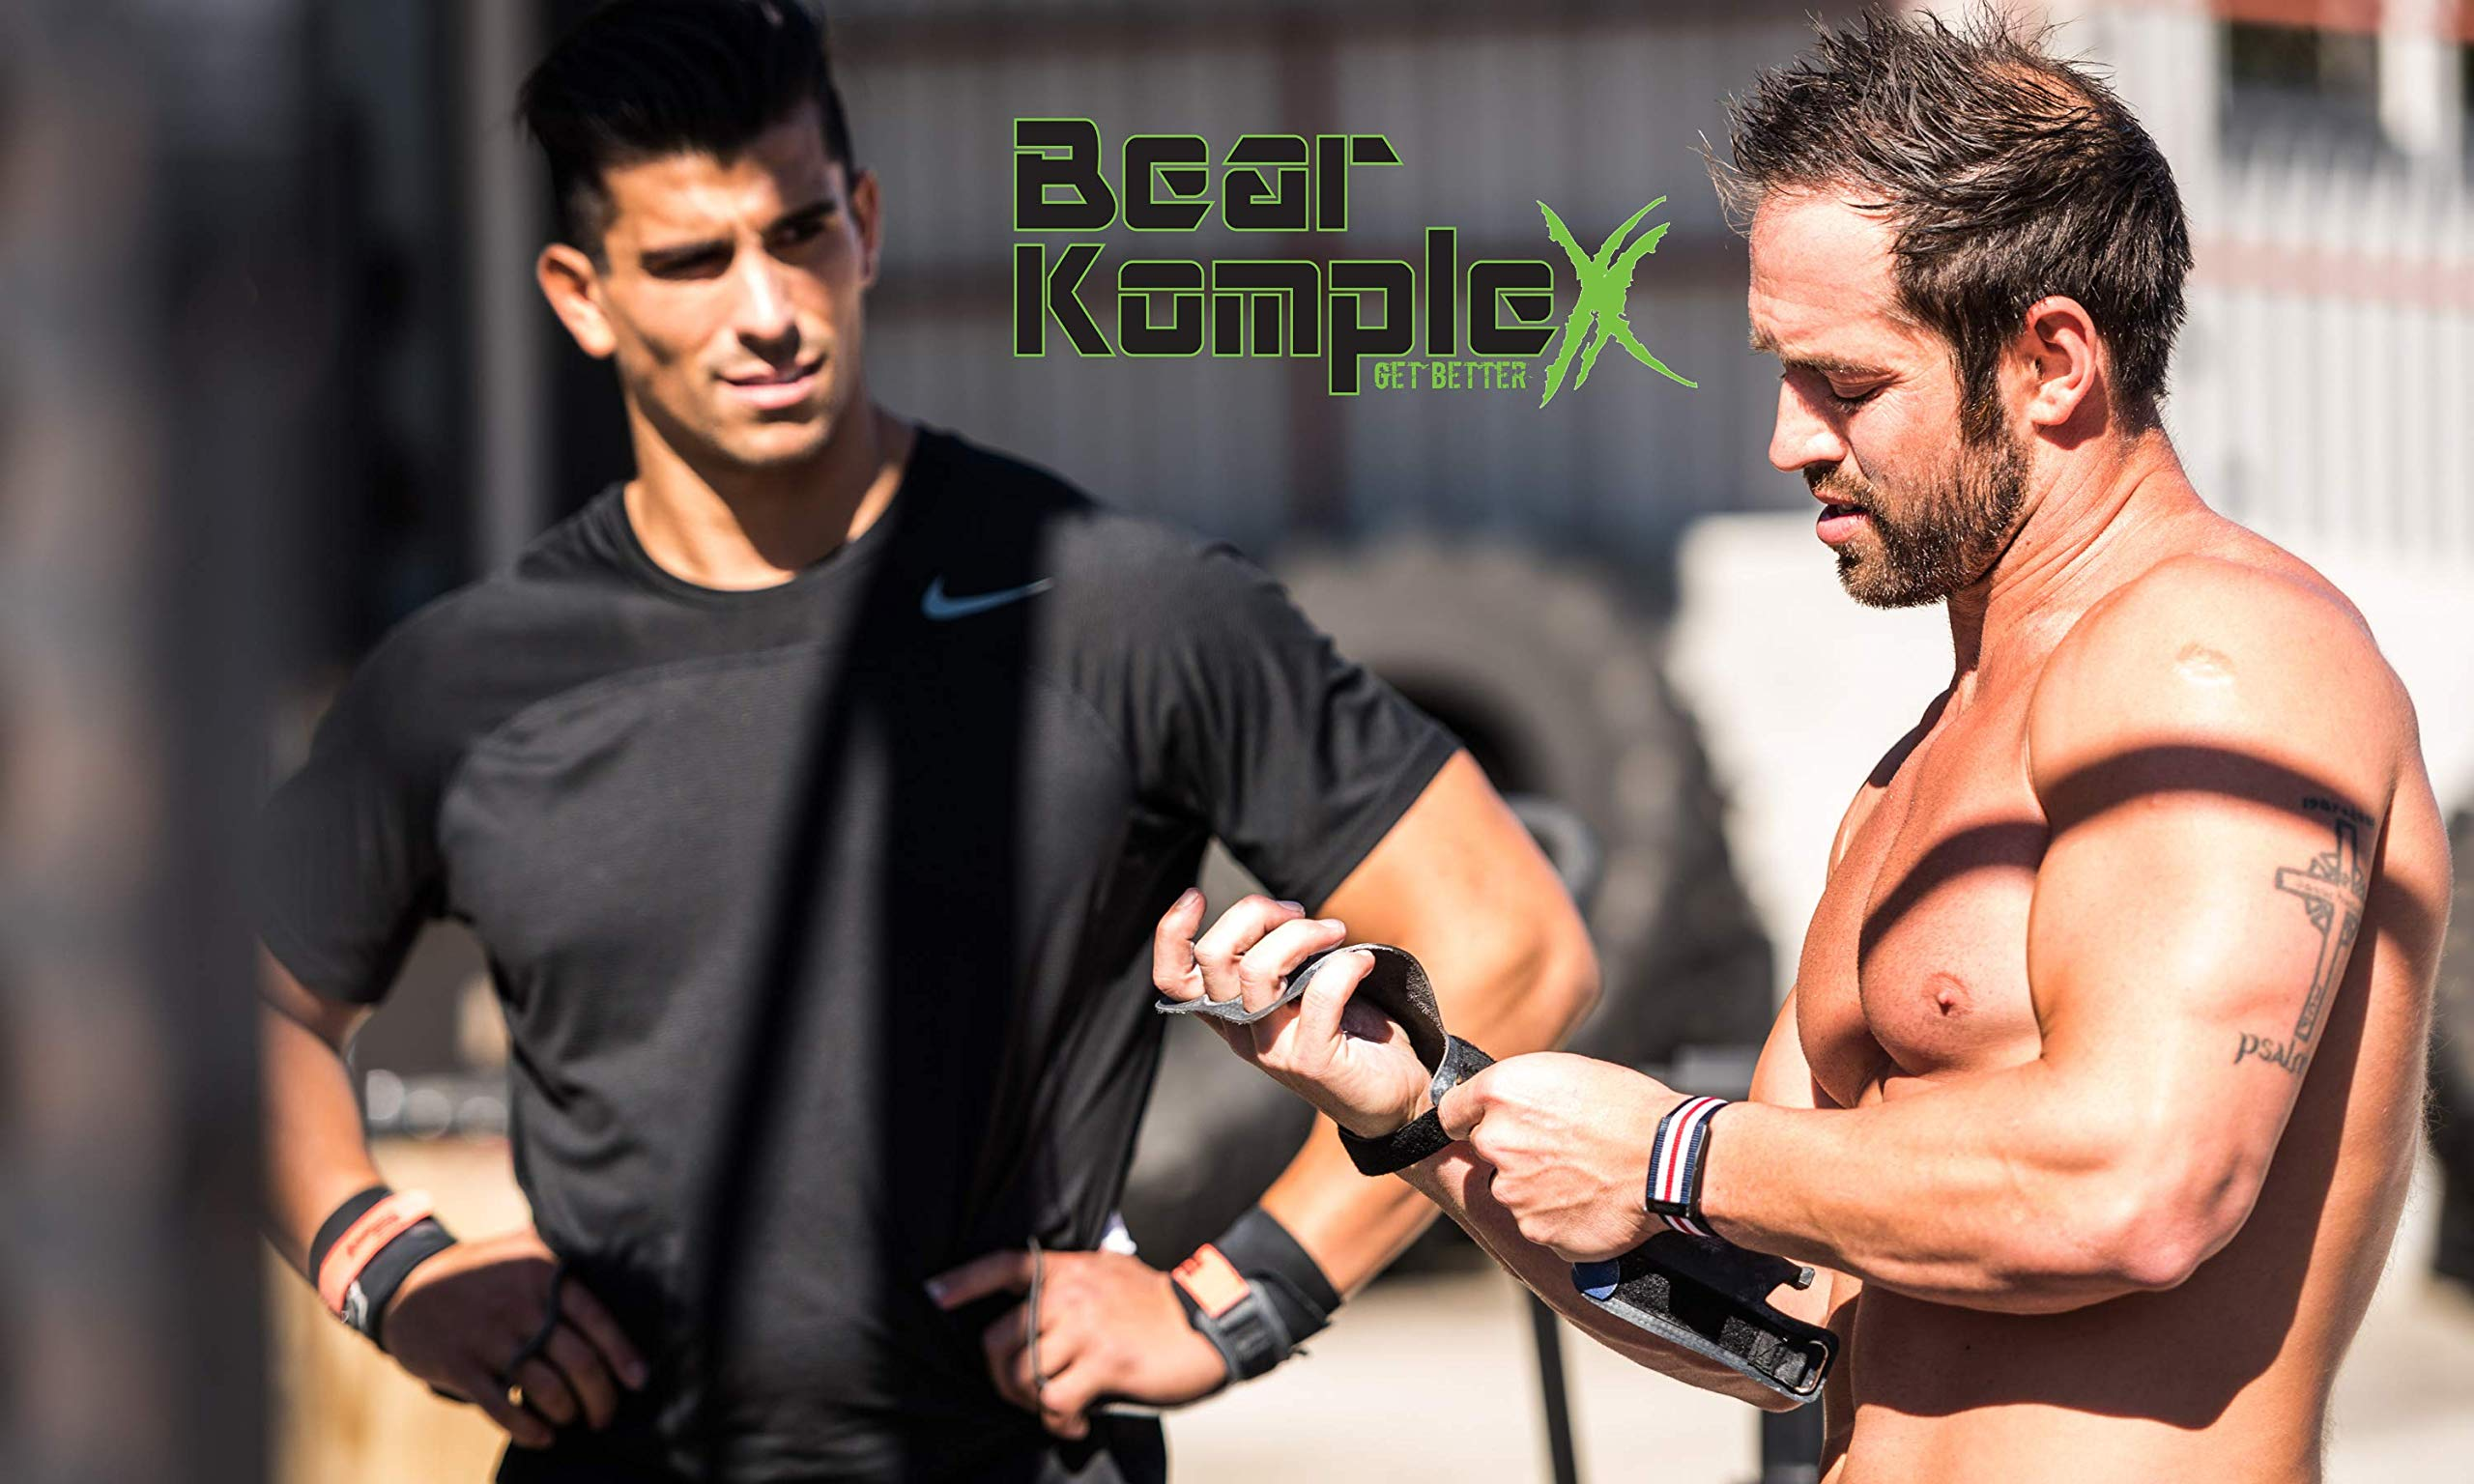 b95d773380dfa Bear KompleX 3 Hole Leather Hand Grips for Gymnastics&Crossfit,Pull ...